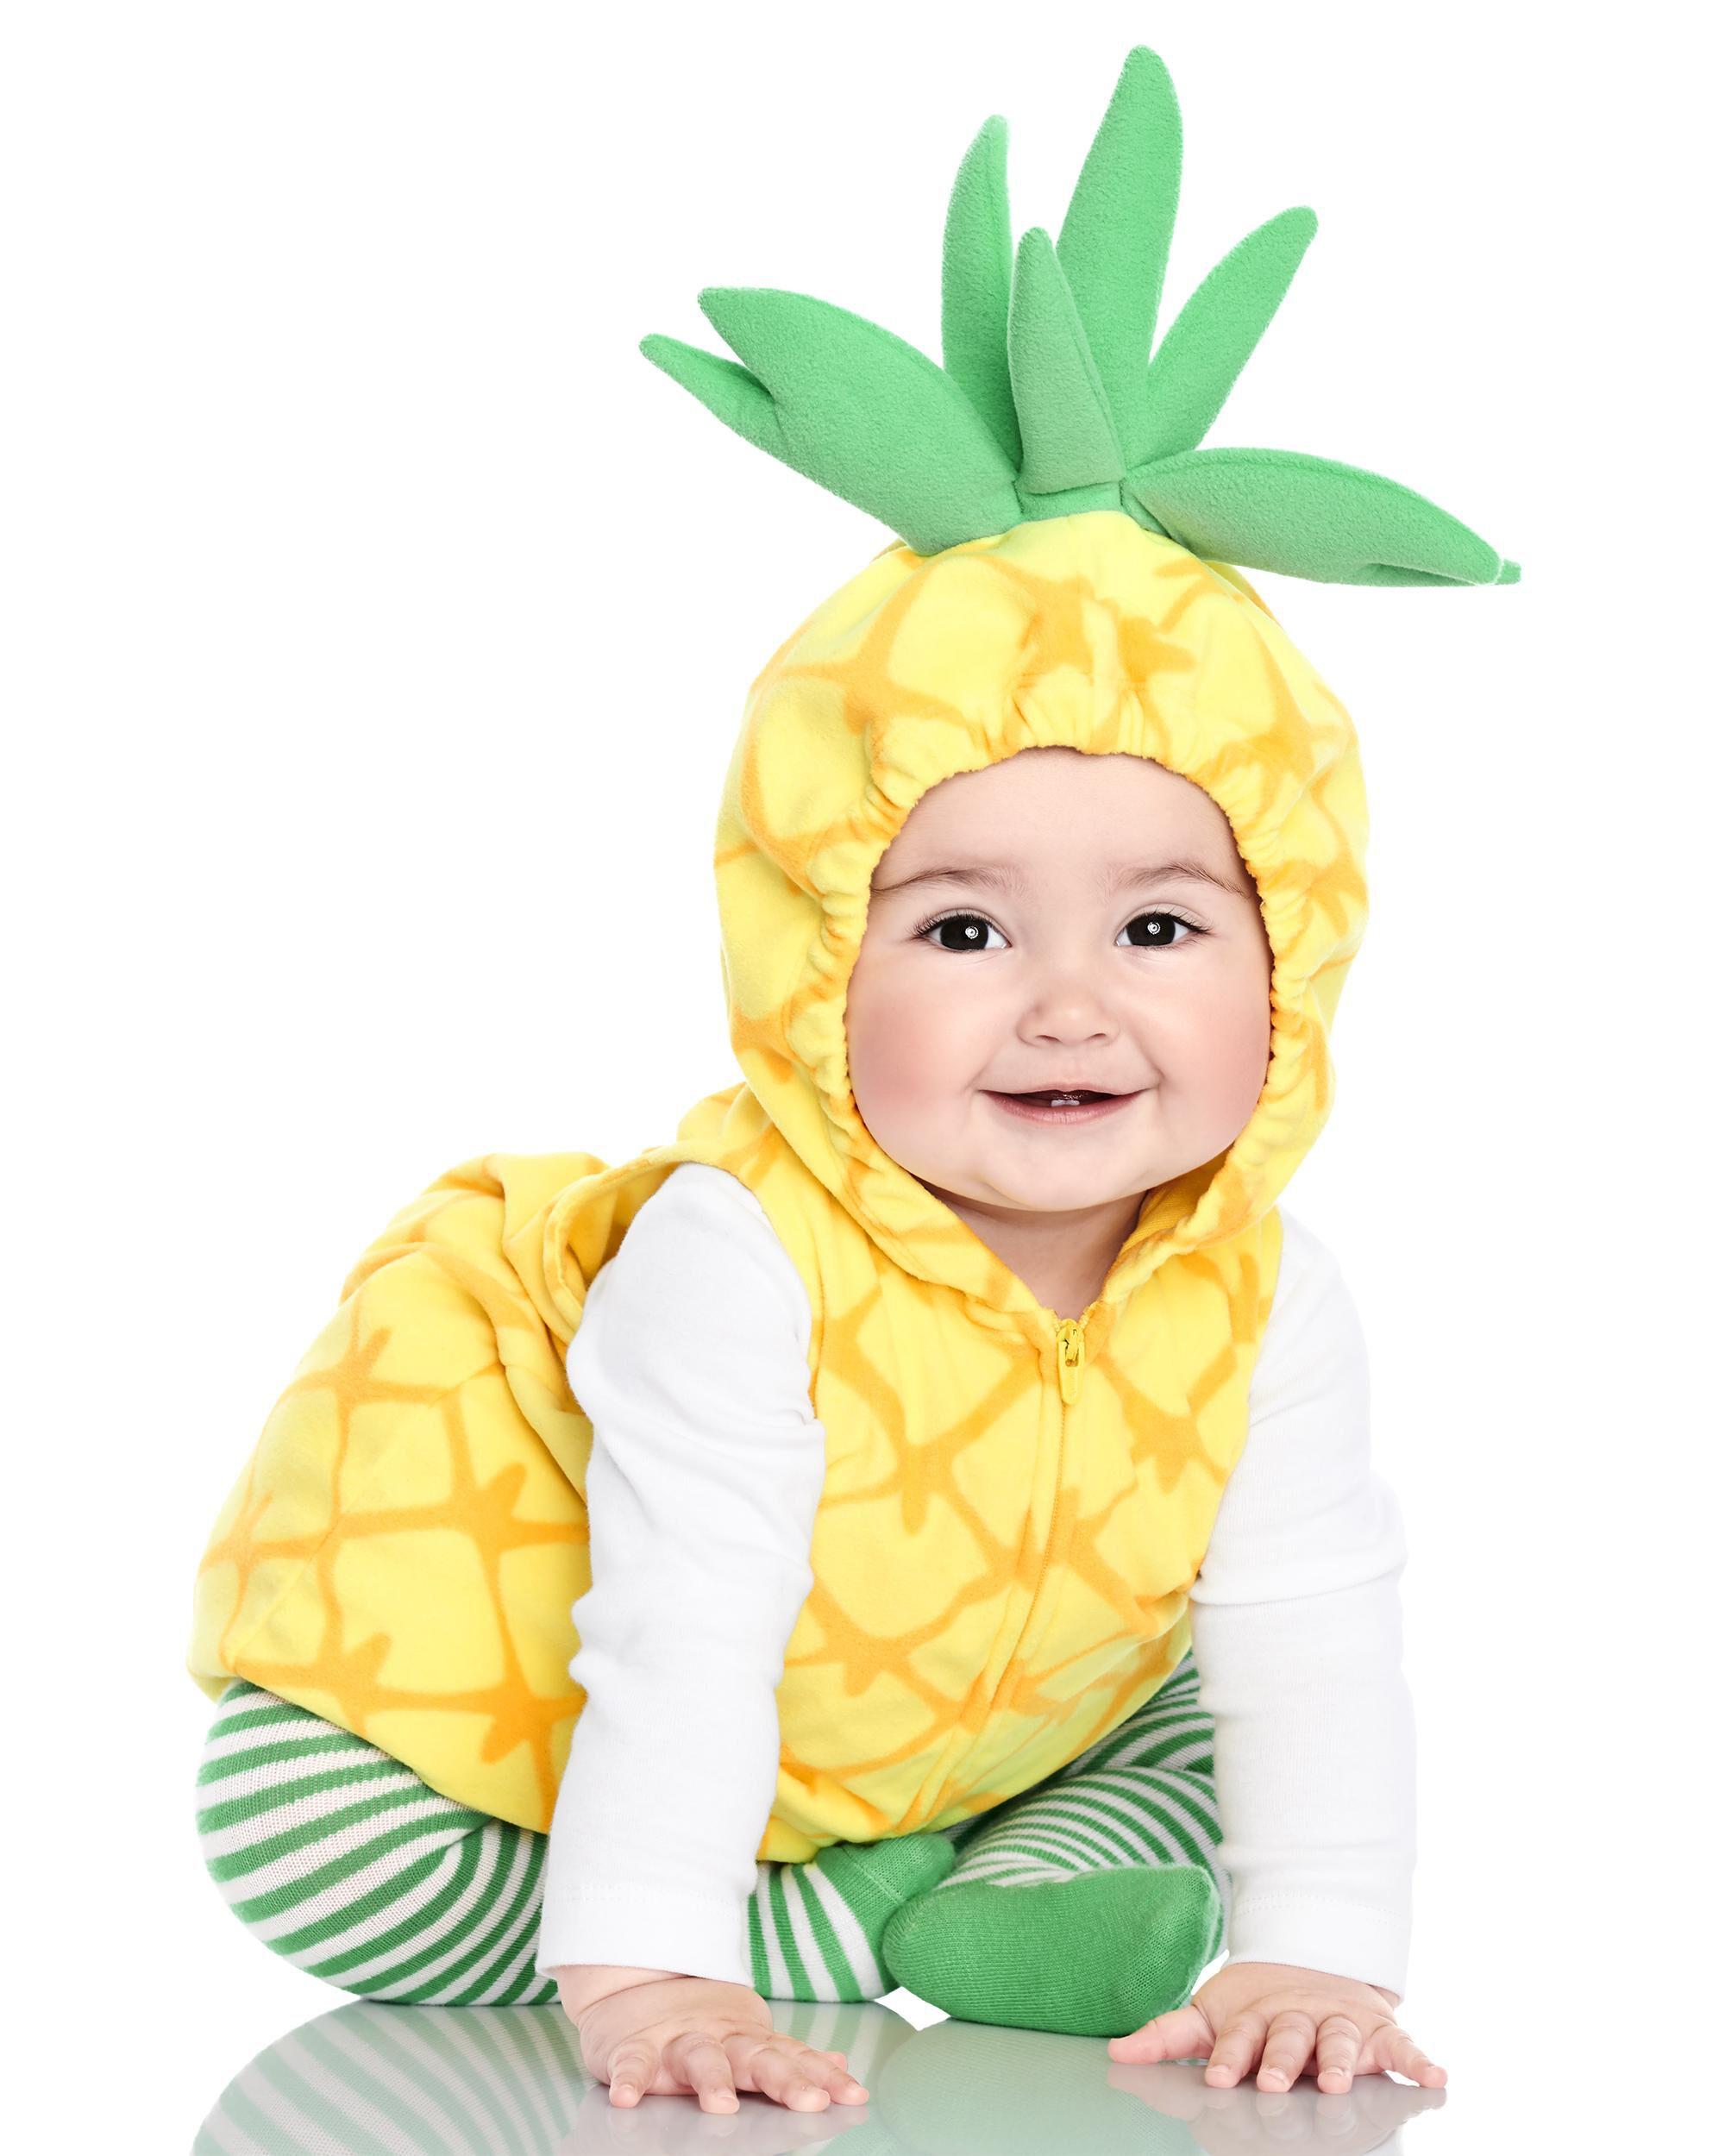 Little Pineapple Halloween Costume  sc 1 st  Carteru0027s & Baby Girl Halloween Costumes | Carters.com